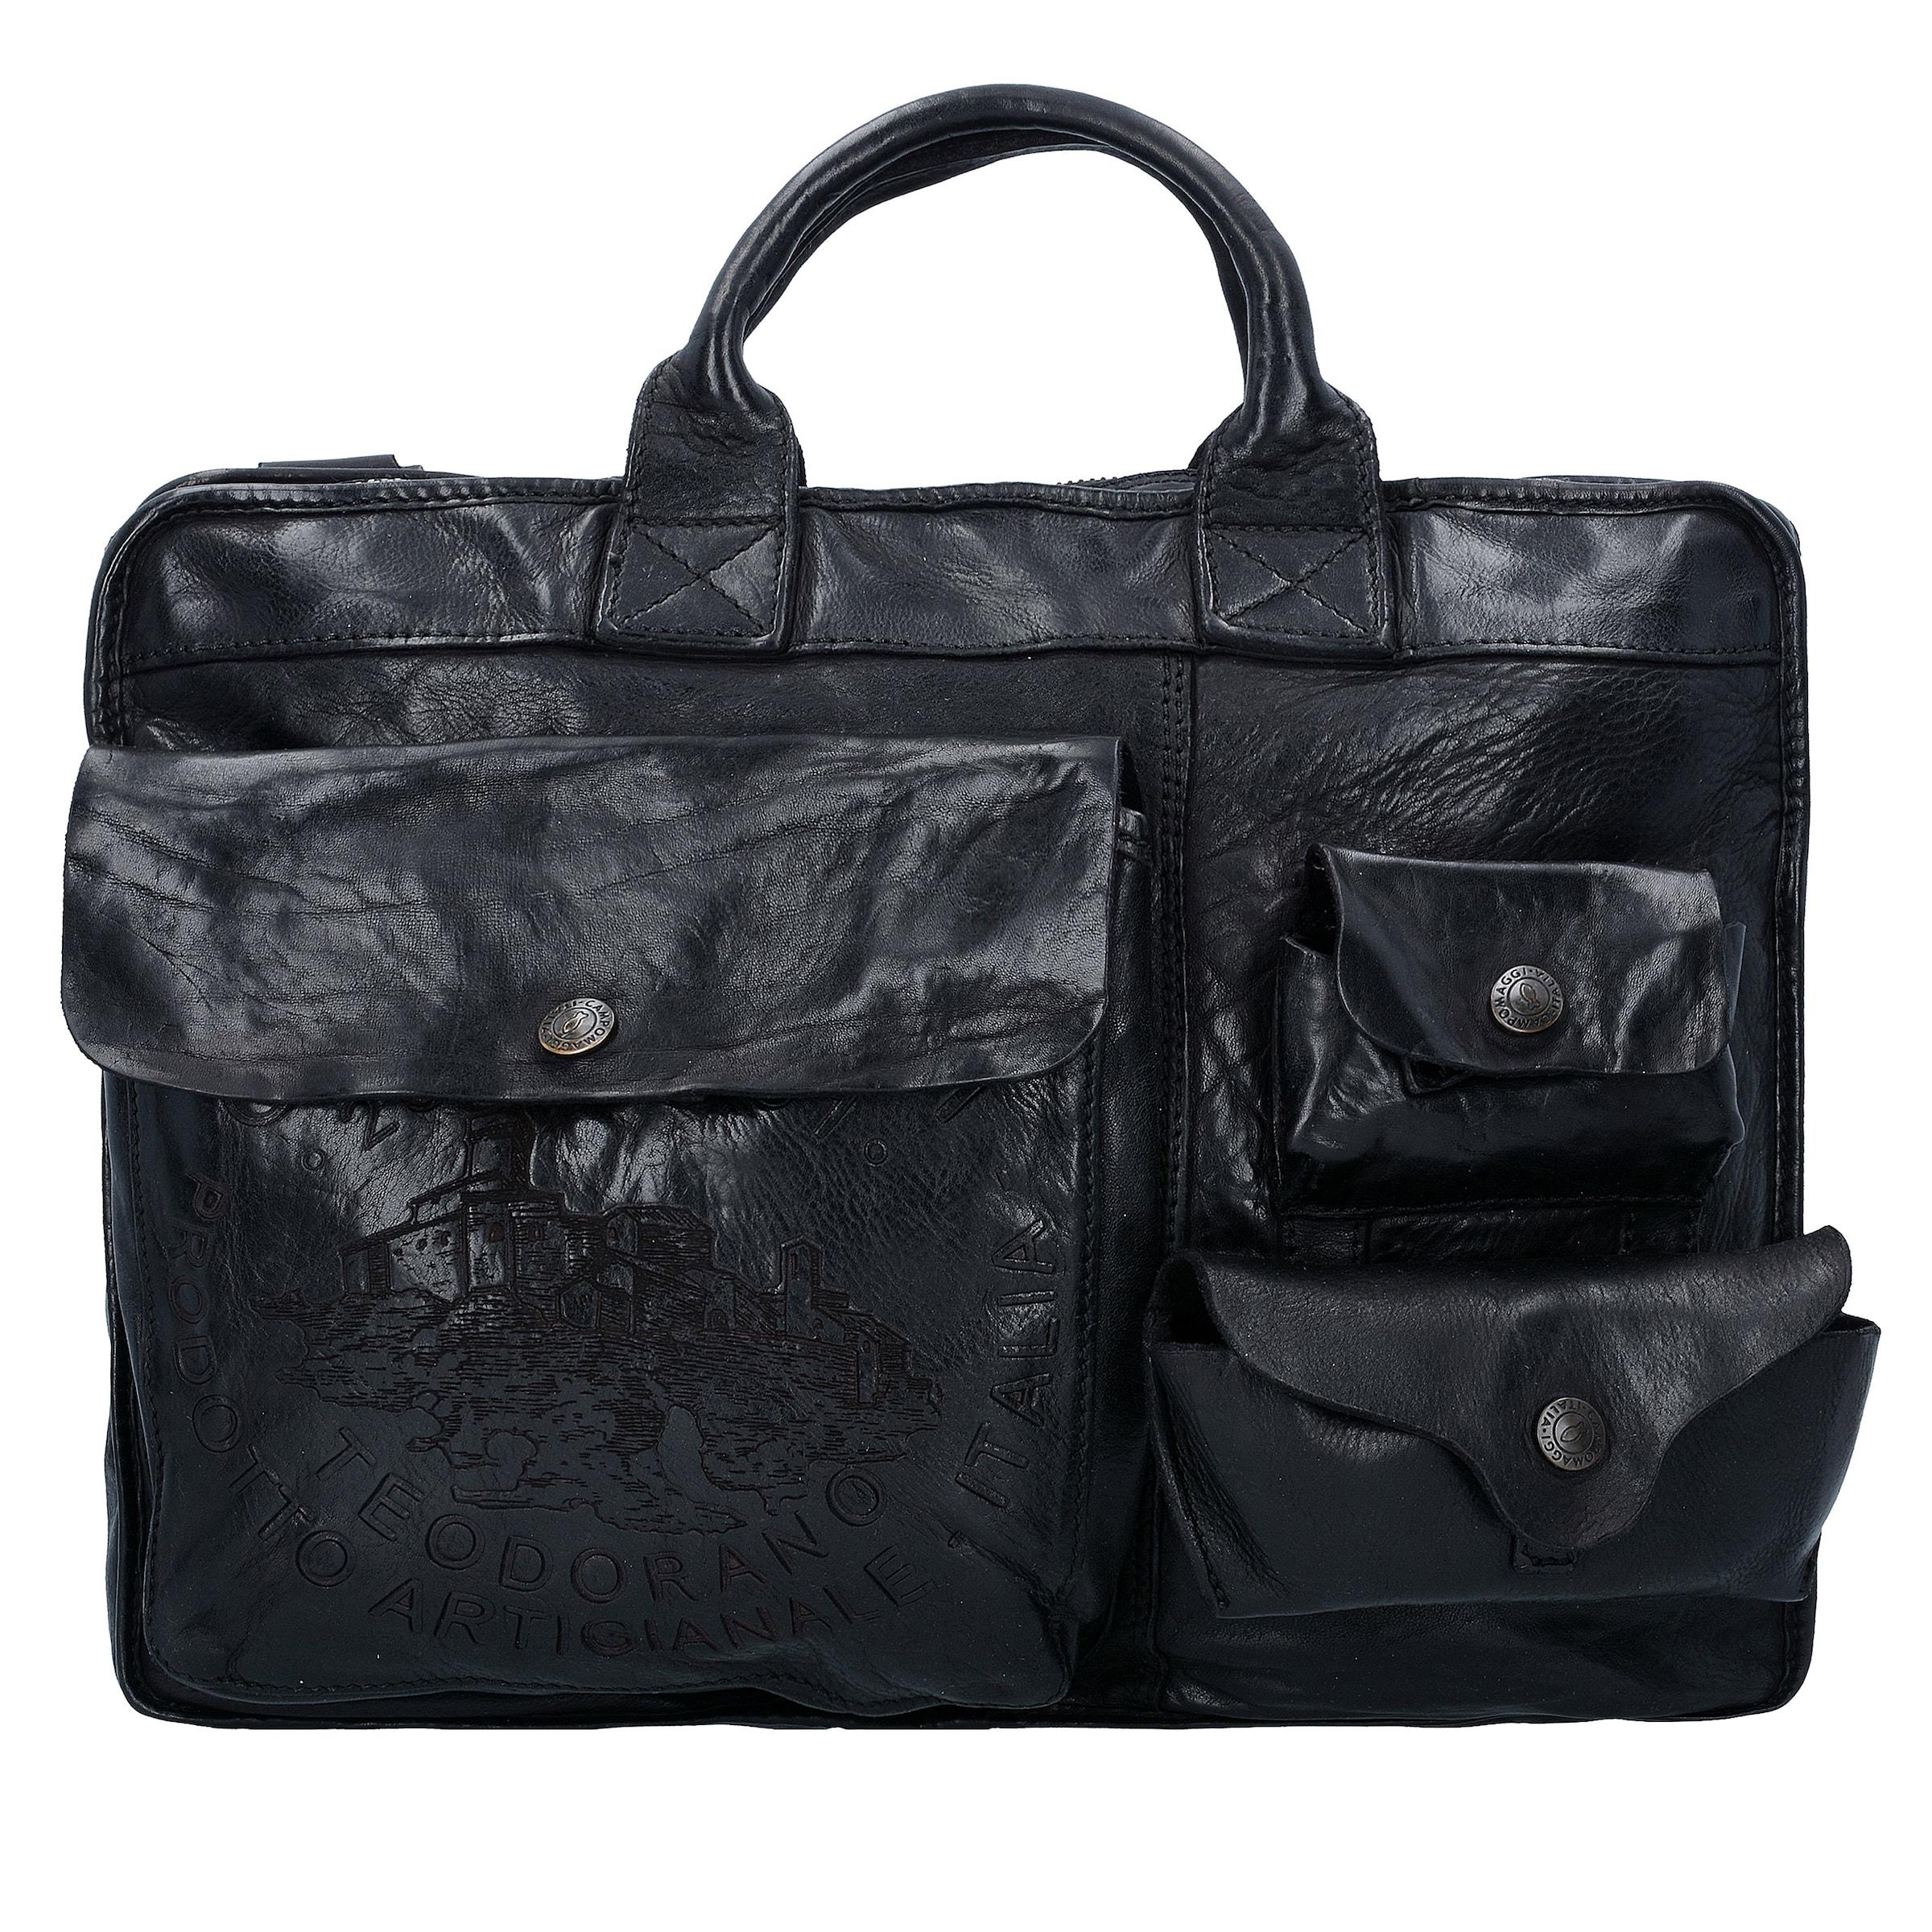 Campomaggi Traditional Carvi Businesstasche Leder 37 cm Neue Online-Verkauf 7RGVw